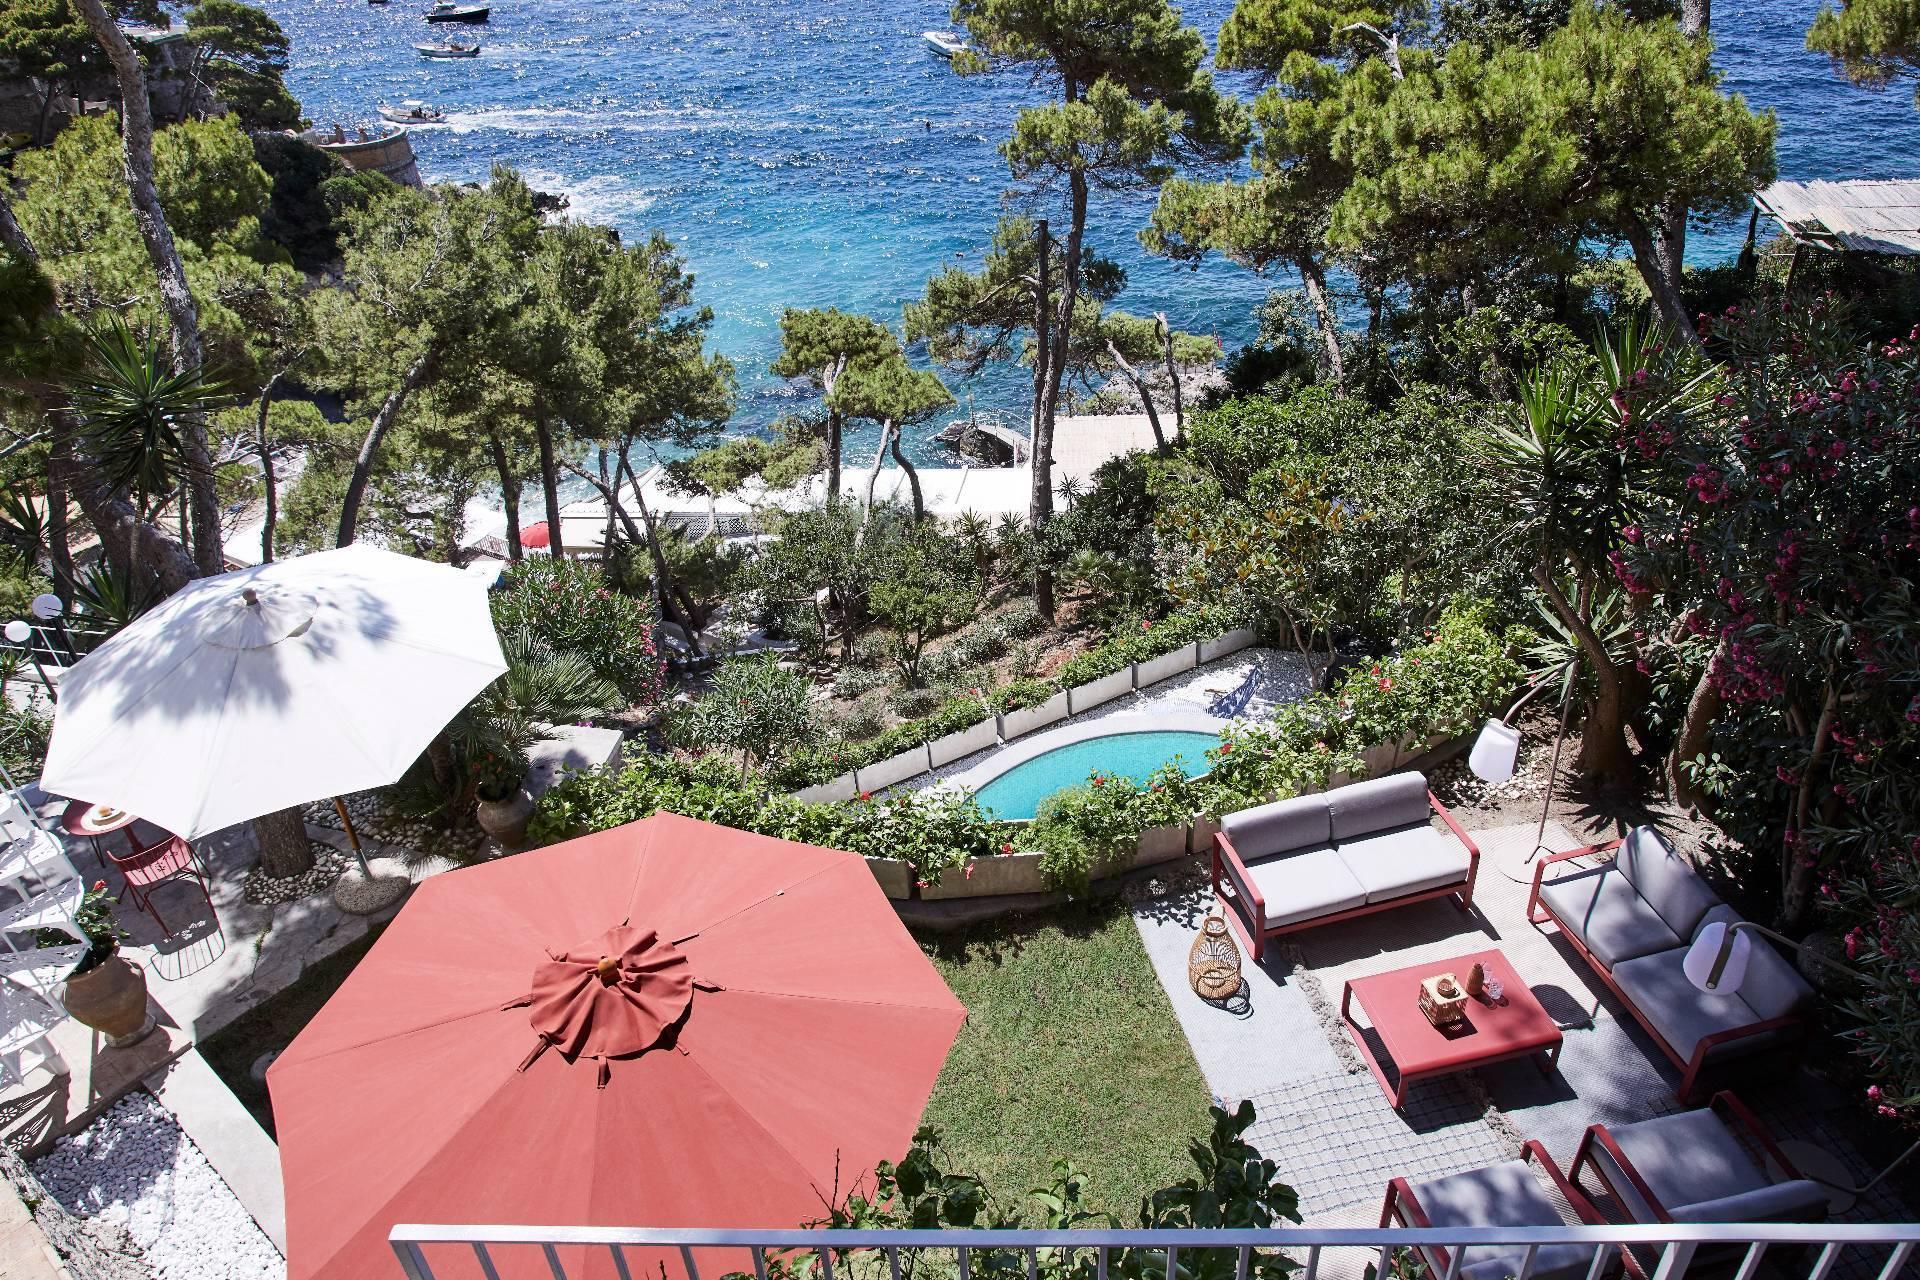 Pied-dans-l'eau Villa in Capri - 2